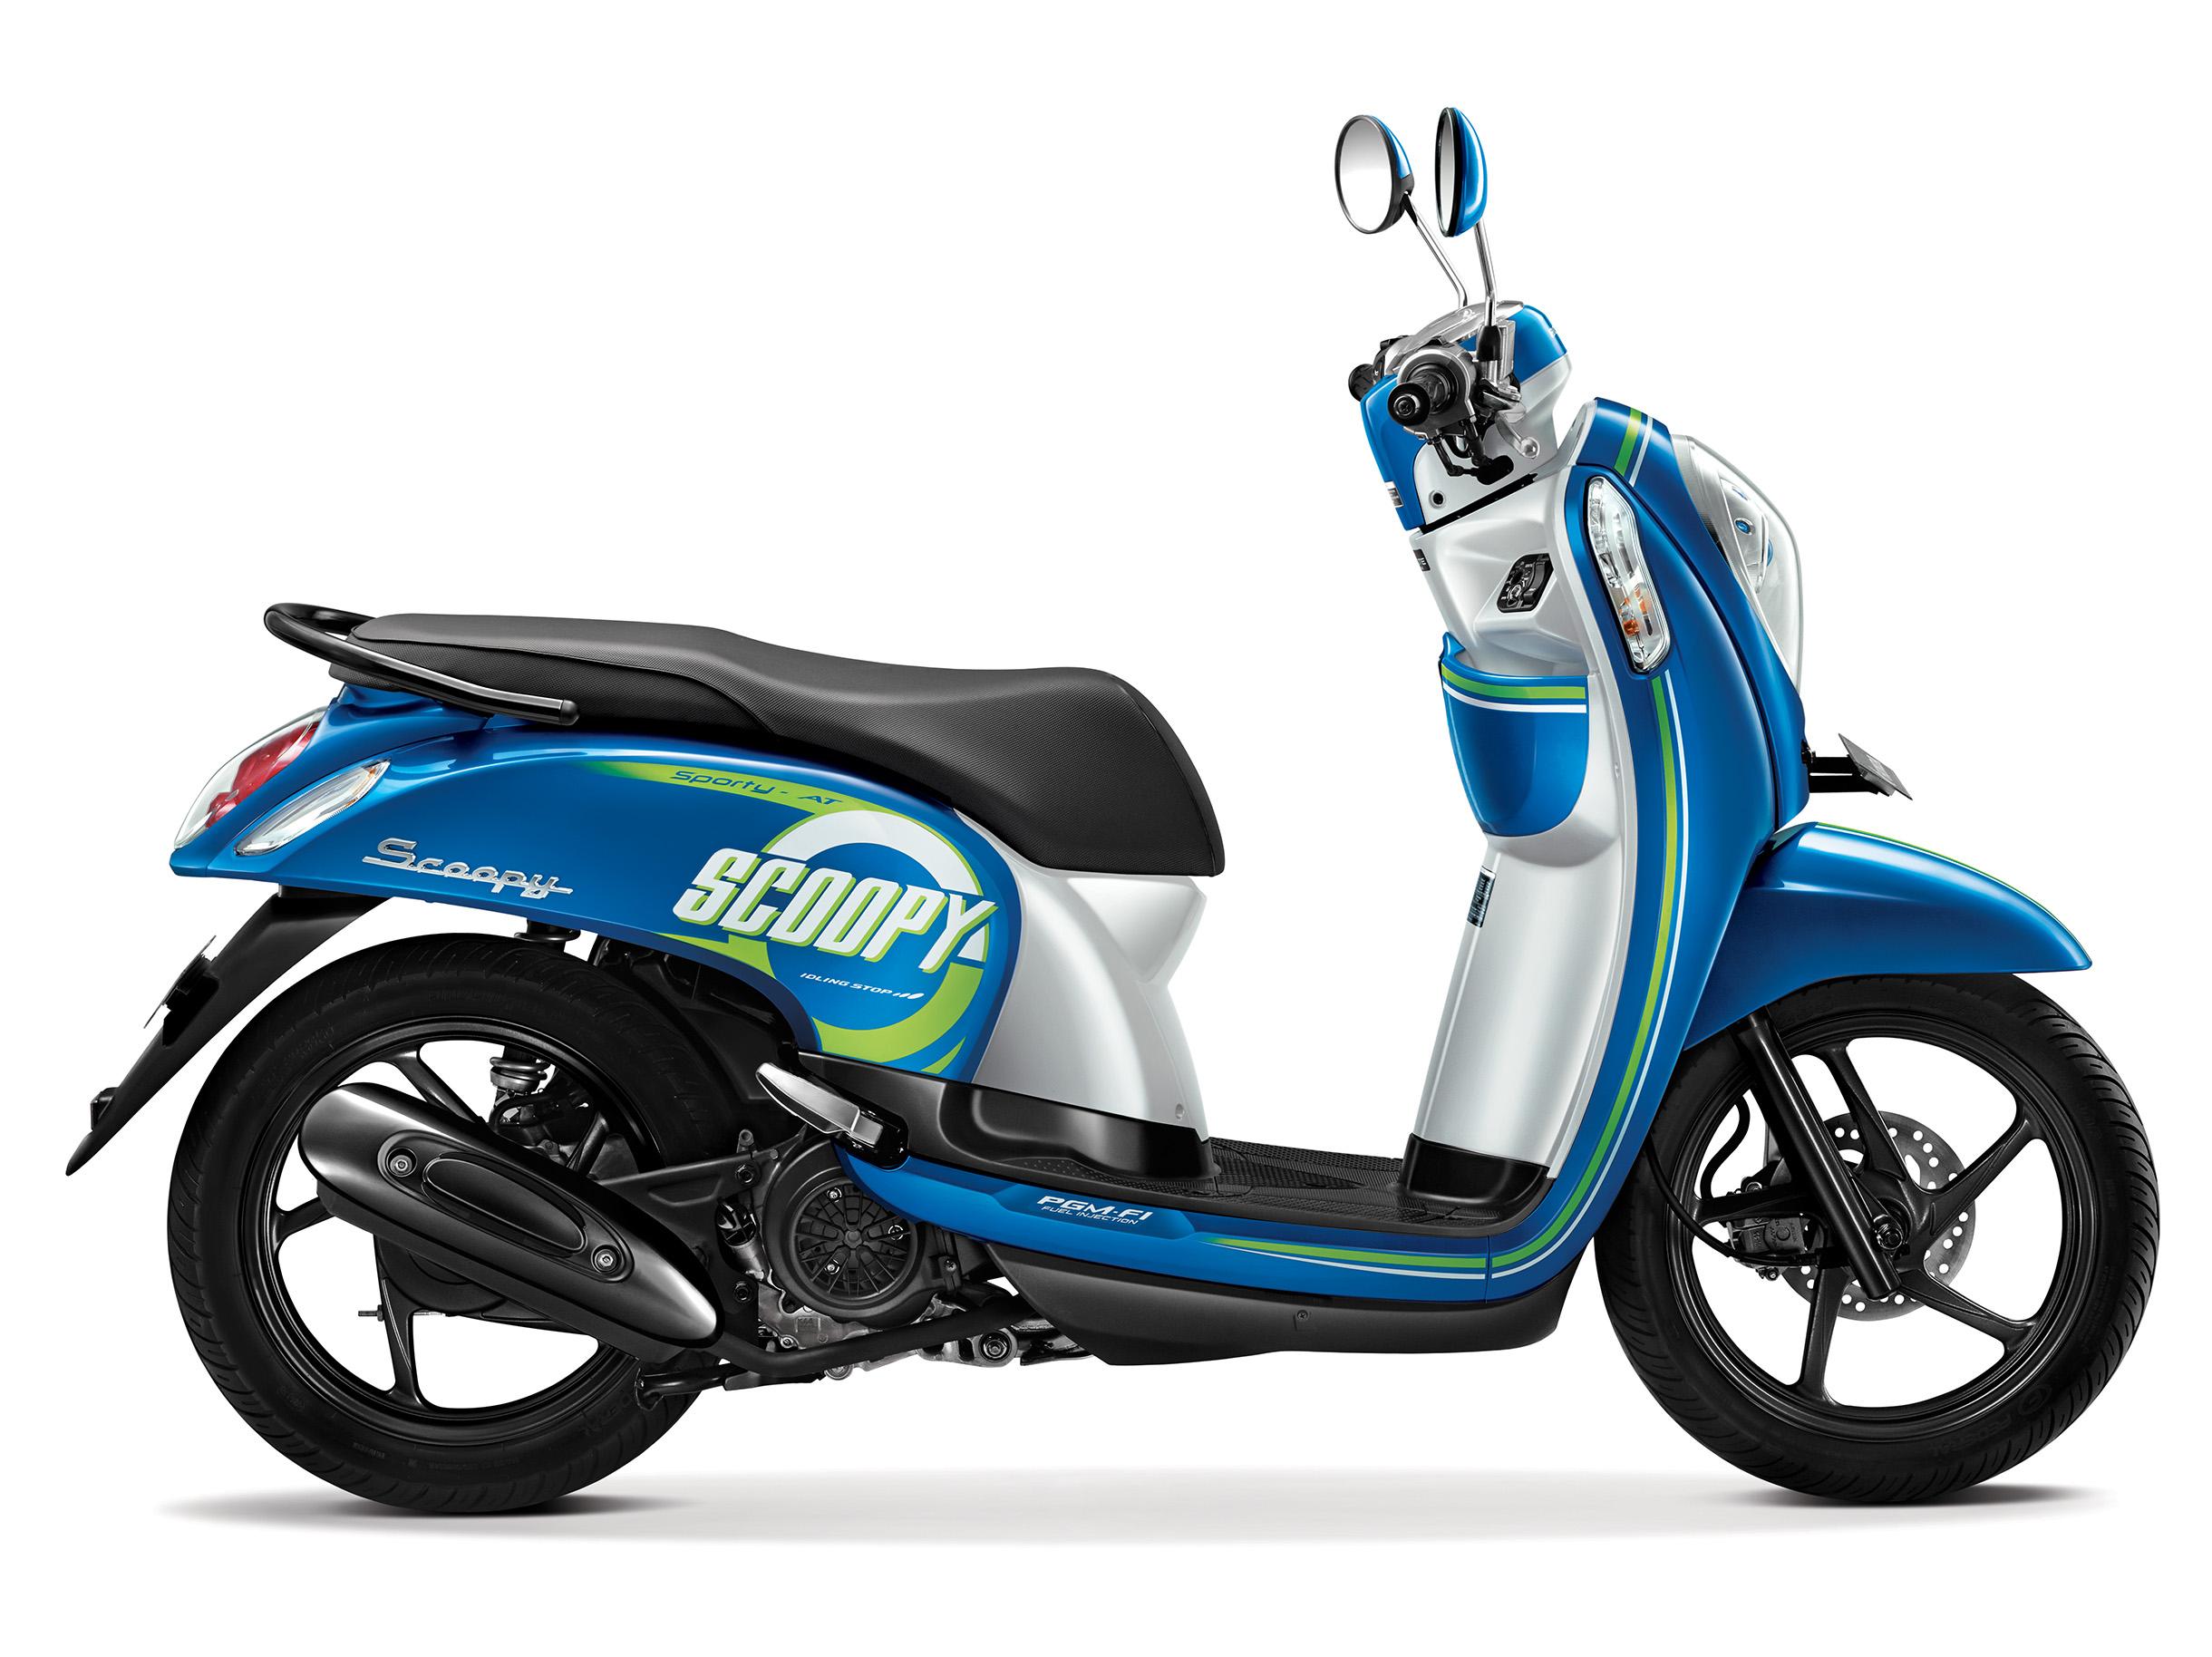 Warna Baru Honda Scoopy Fi 2016 Urban Blue Dan Vogue Red Harga